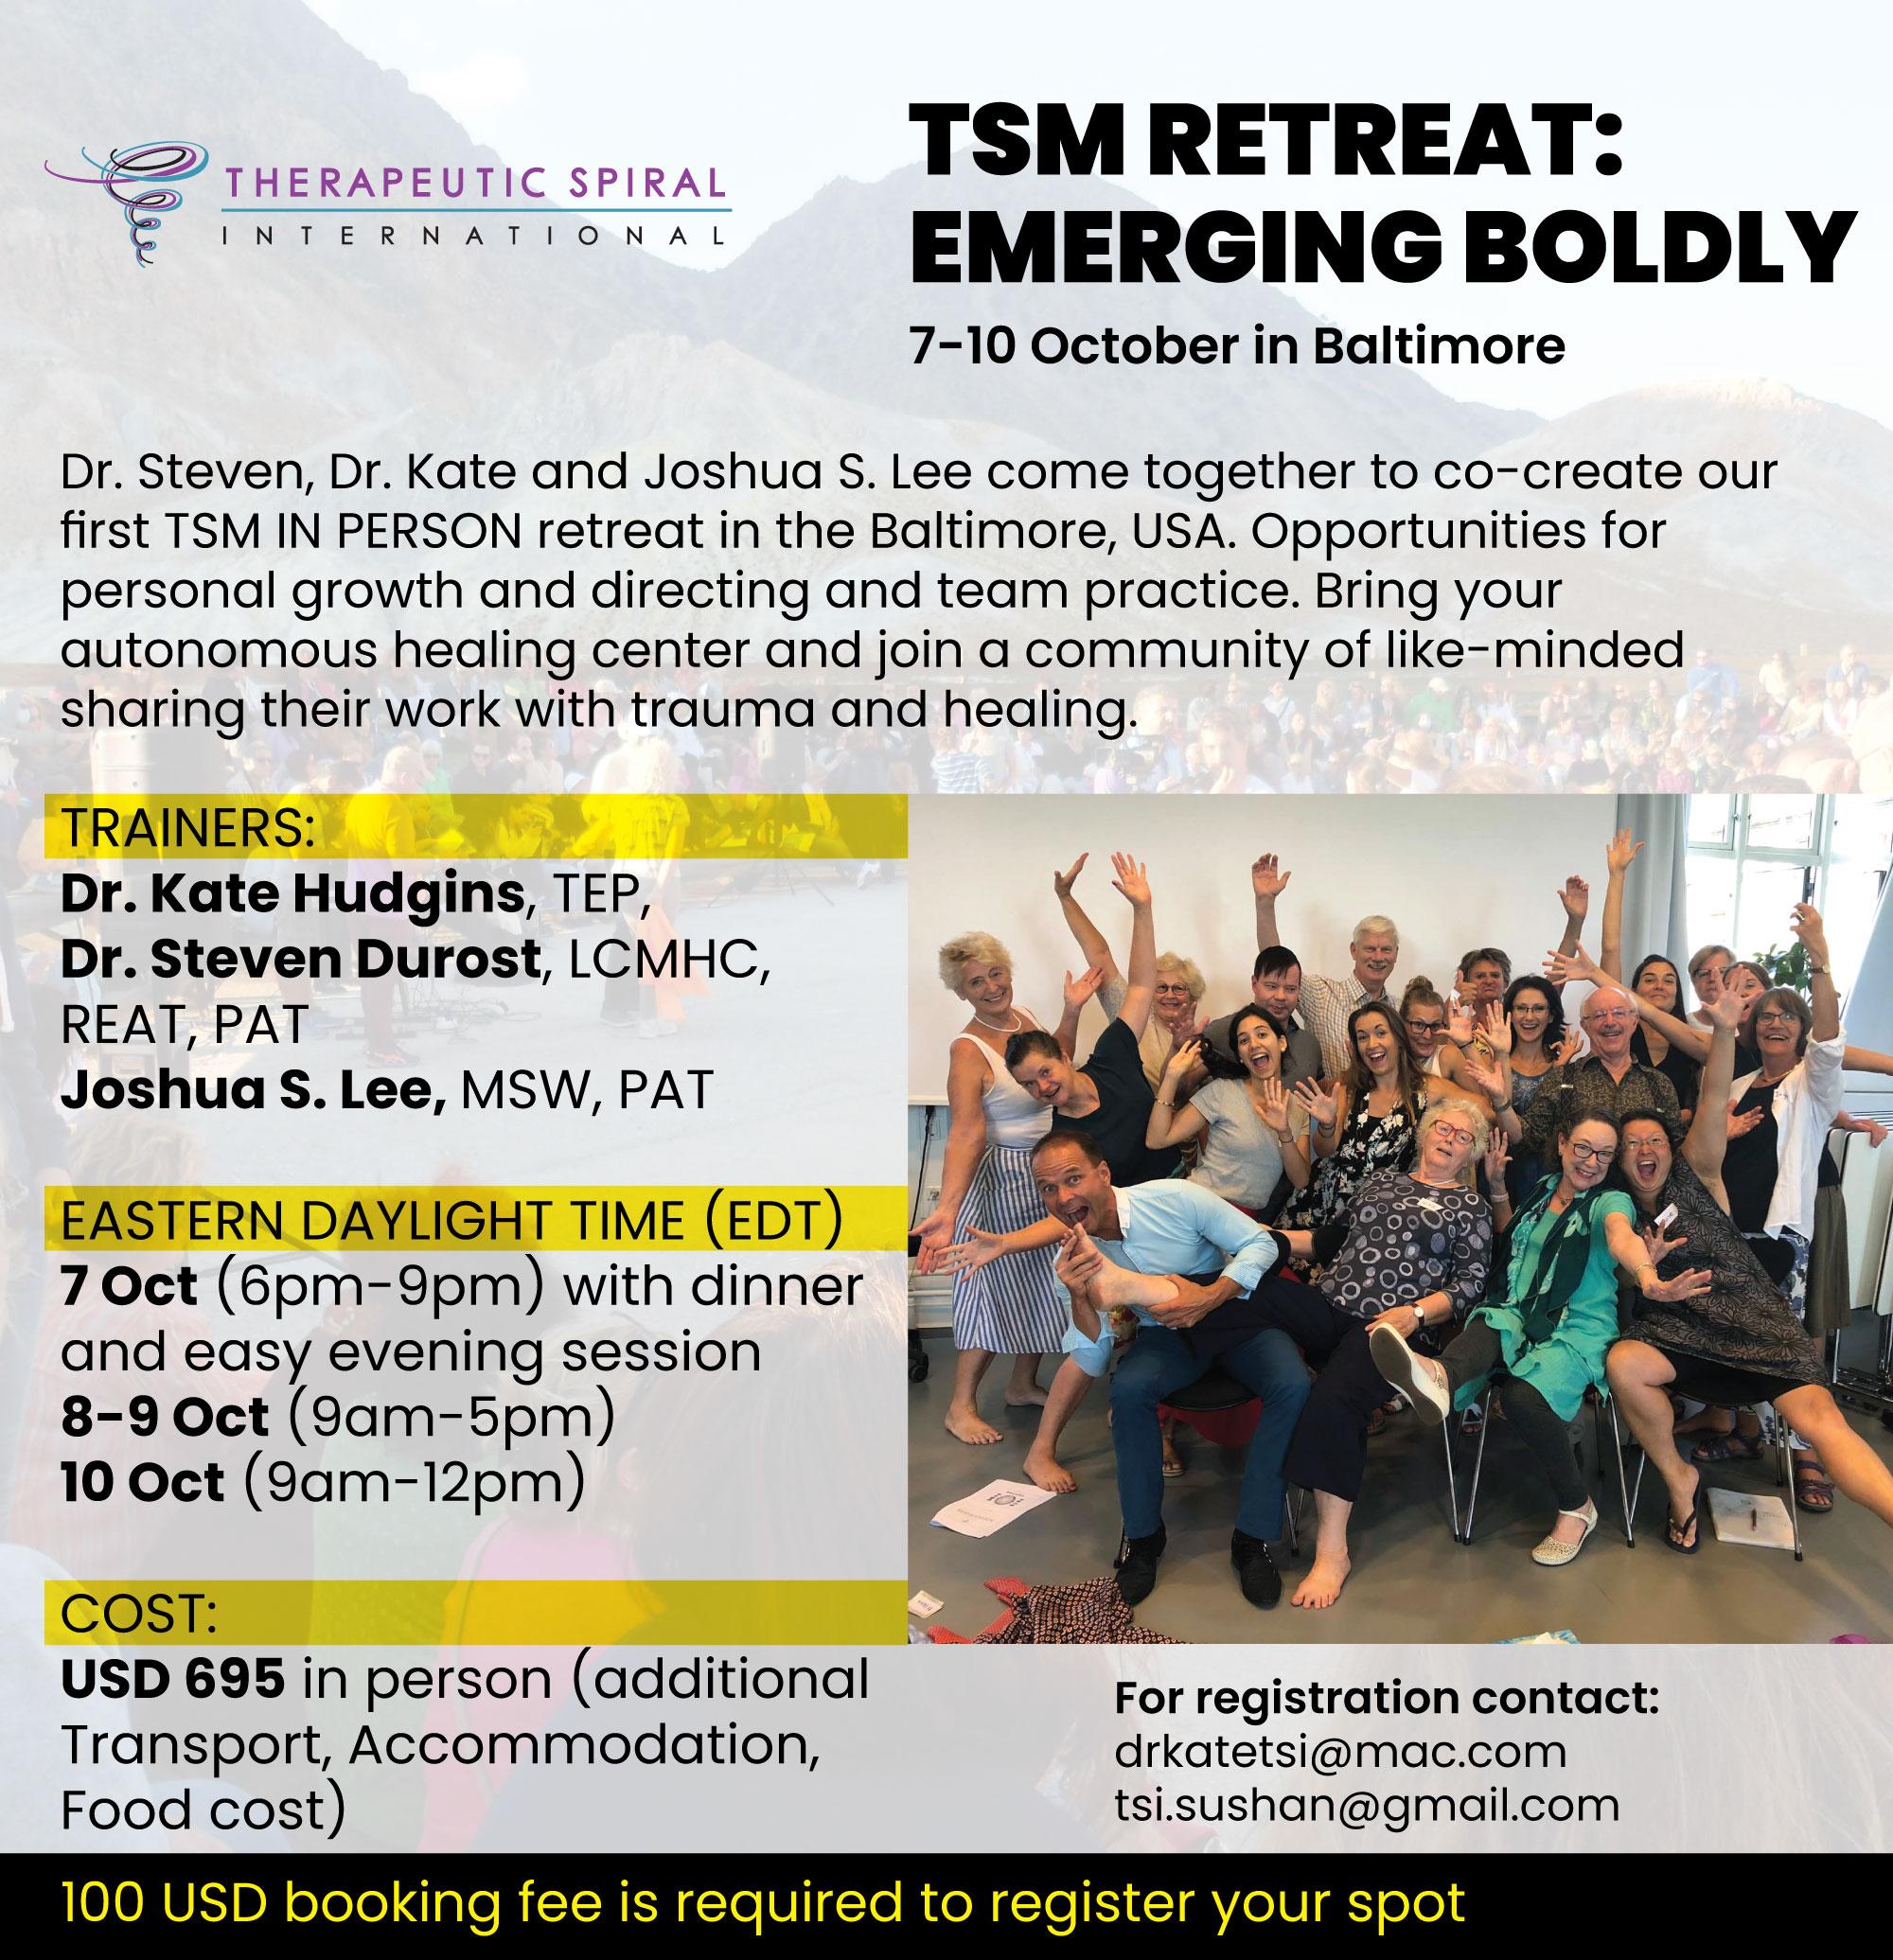 TSM Retreat: Emerging Boldly @ Baltimore, USA